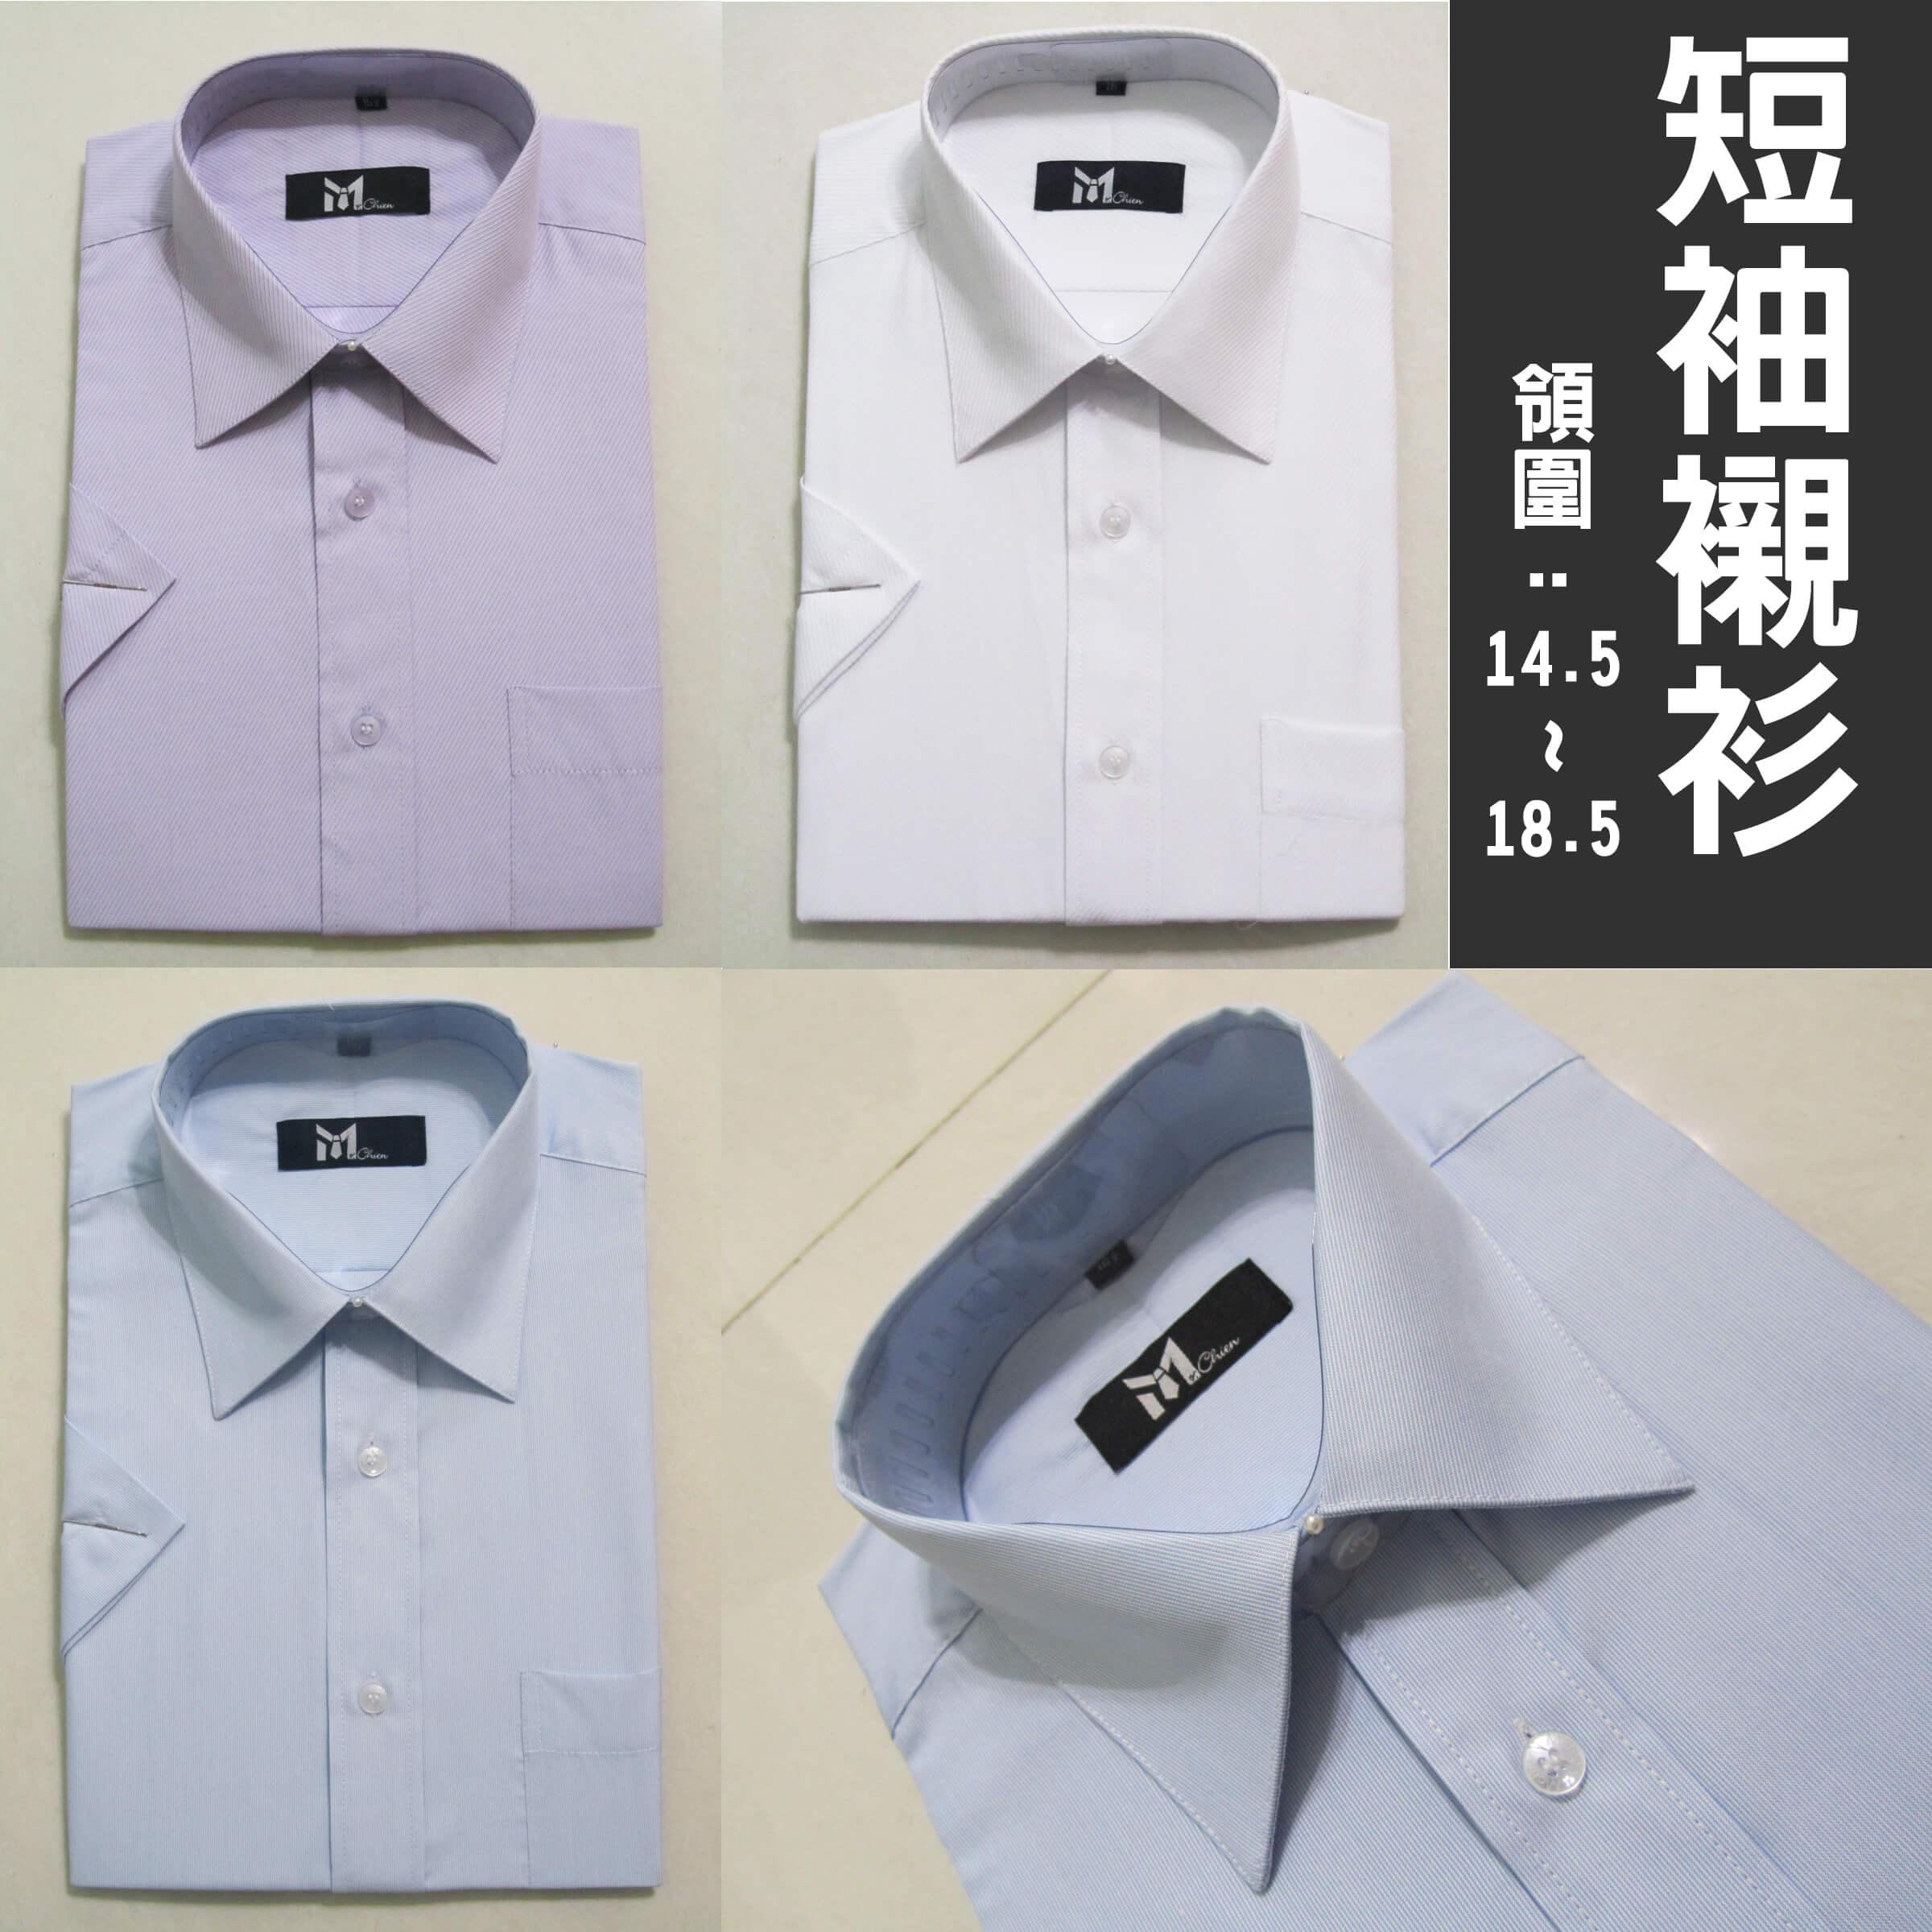 sun~e333短袖條紋襯衫、上班族襯衫、 襯衫、商務襯衫、正式場合襯衫、柔棉舒適襯衫、不